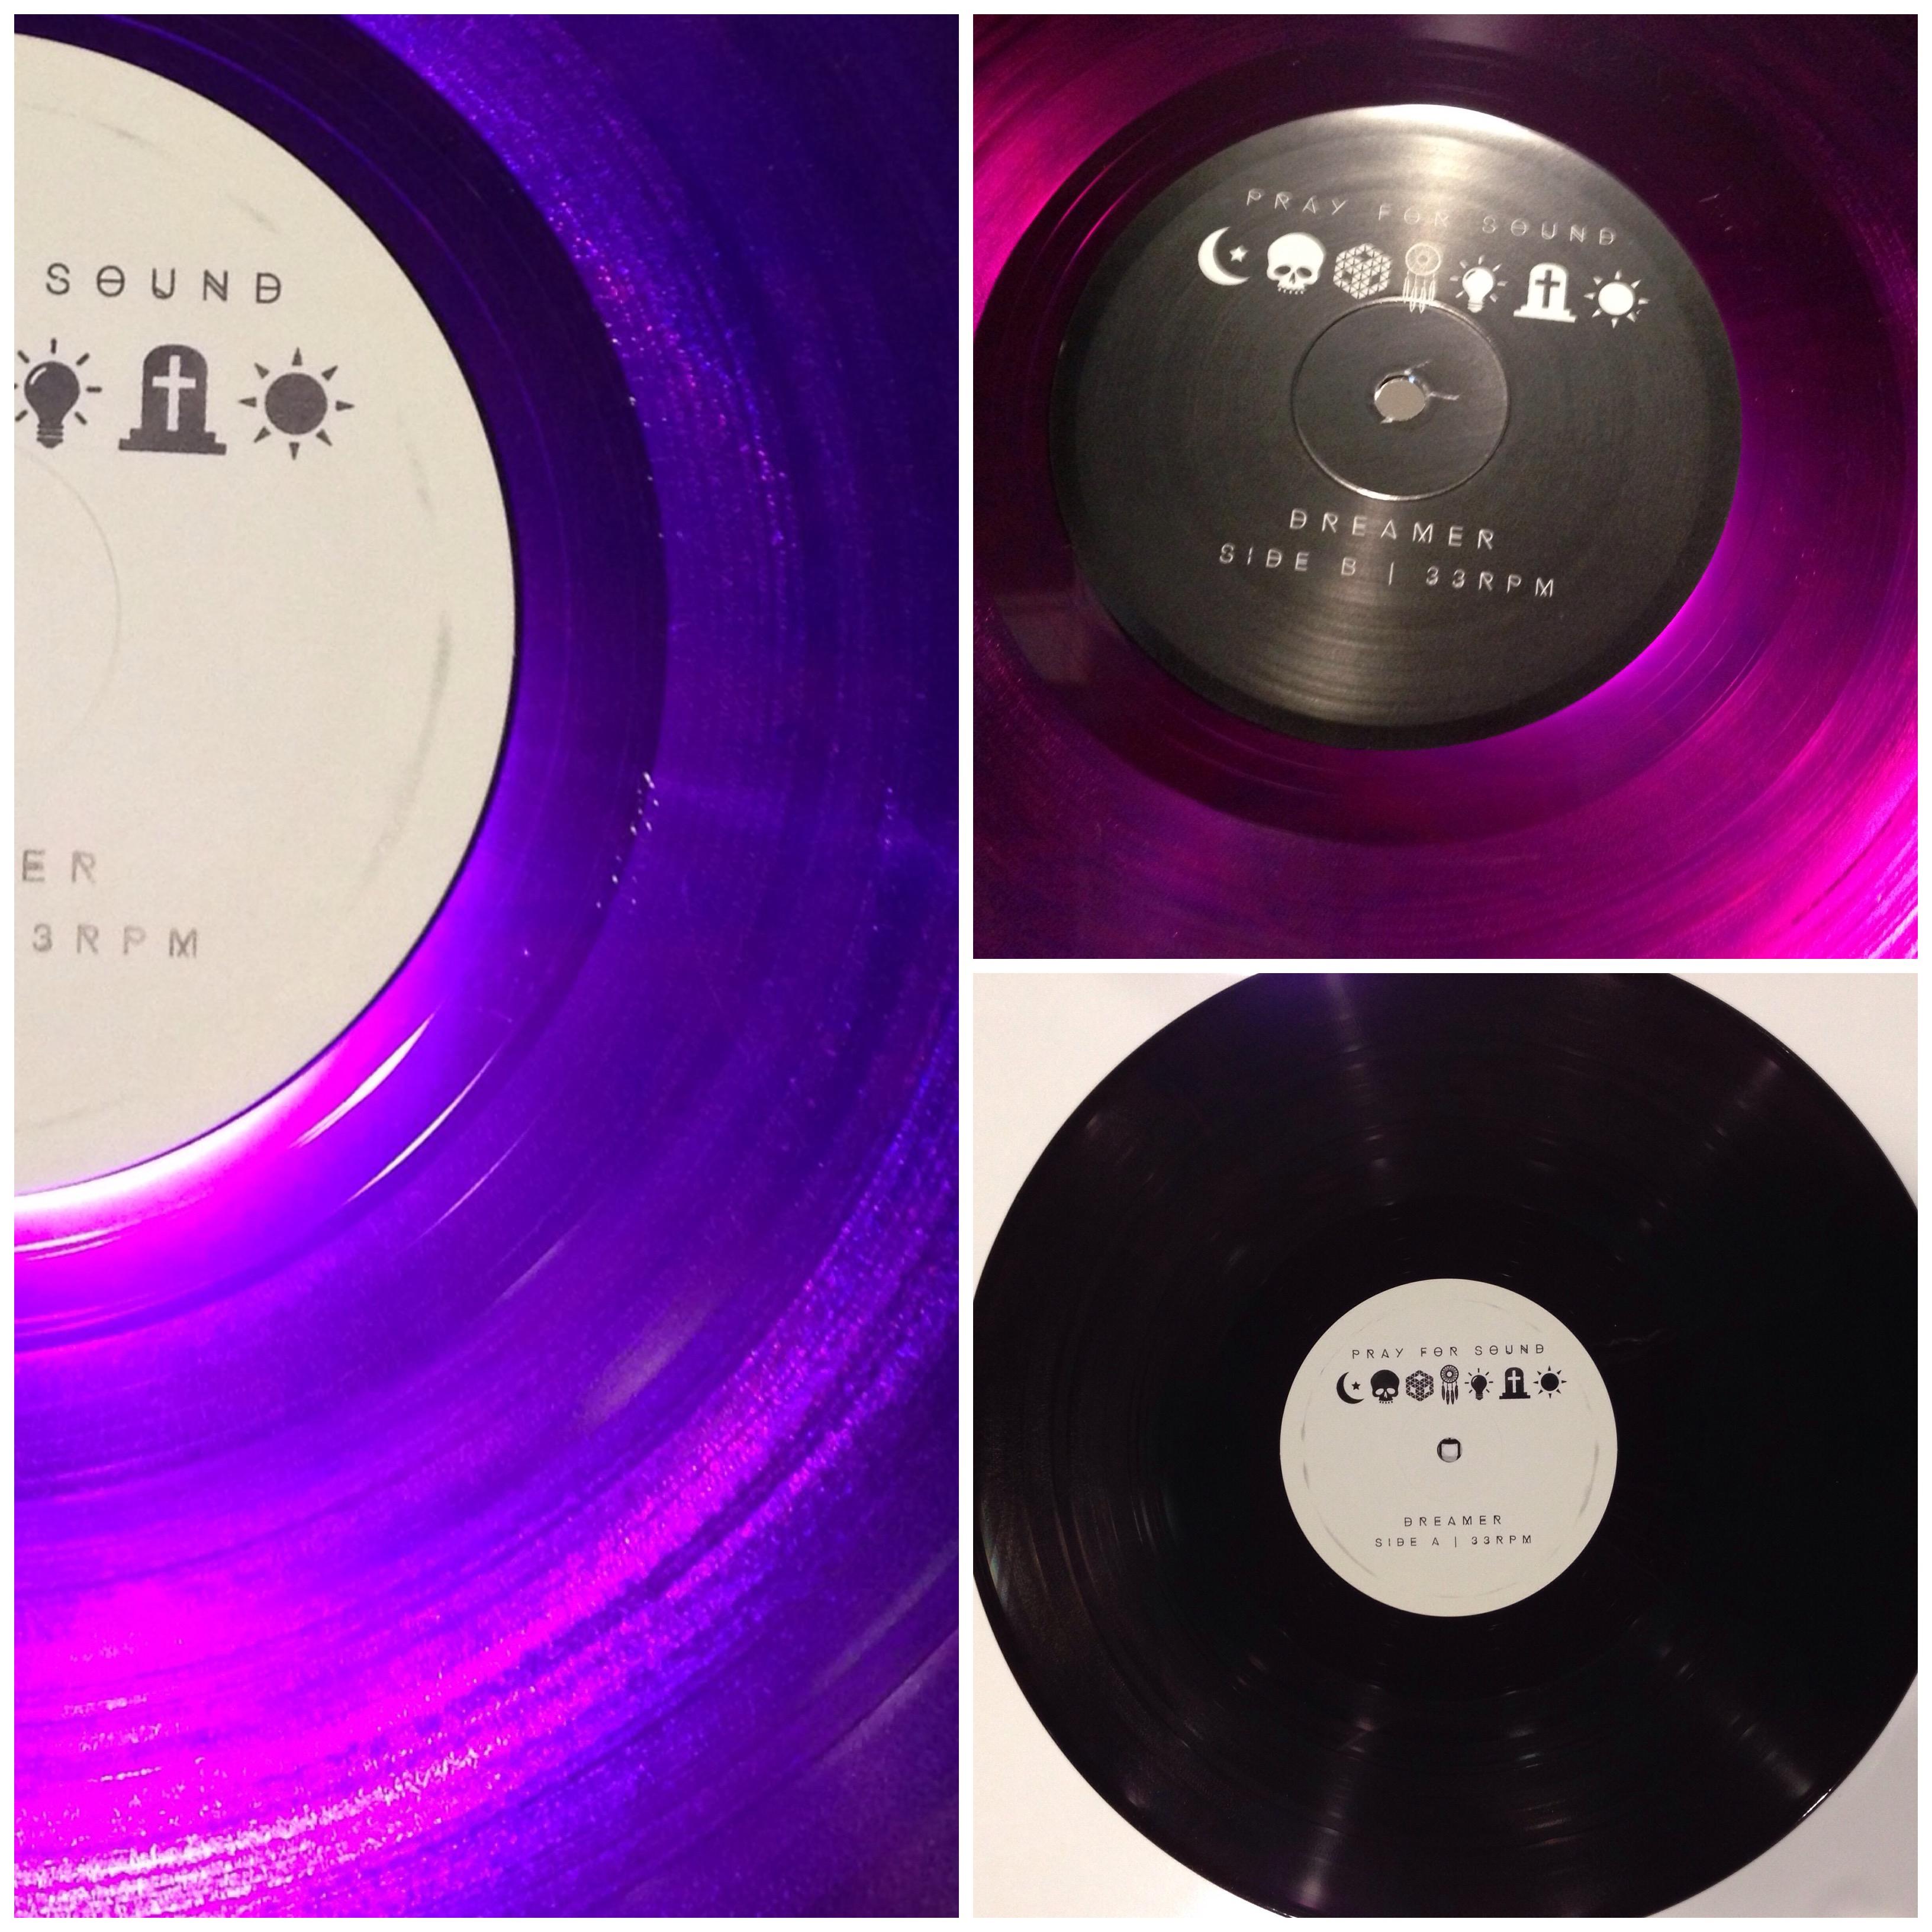 Pray For Sound - Dreamer LP